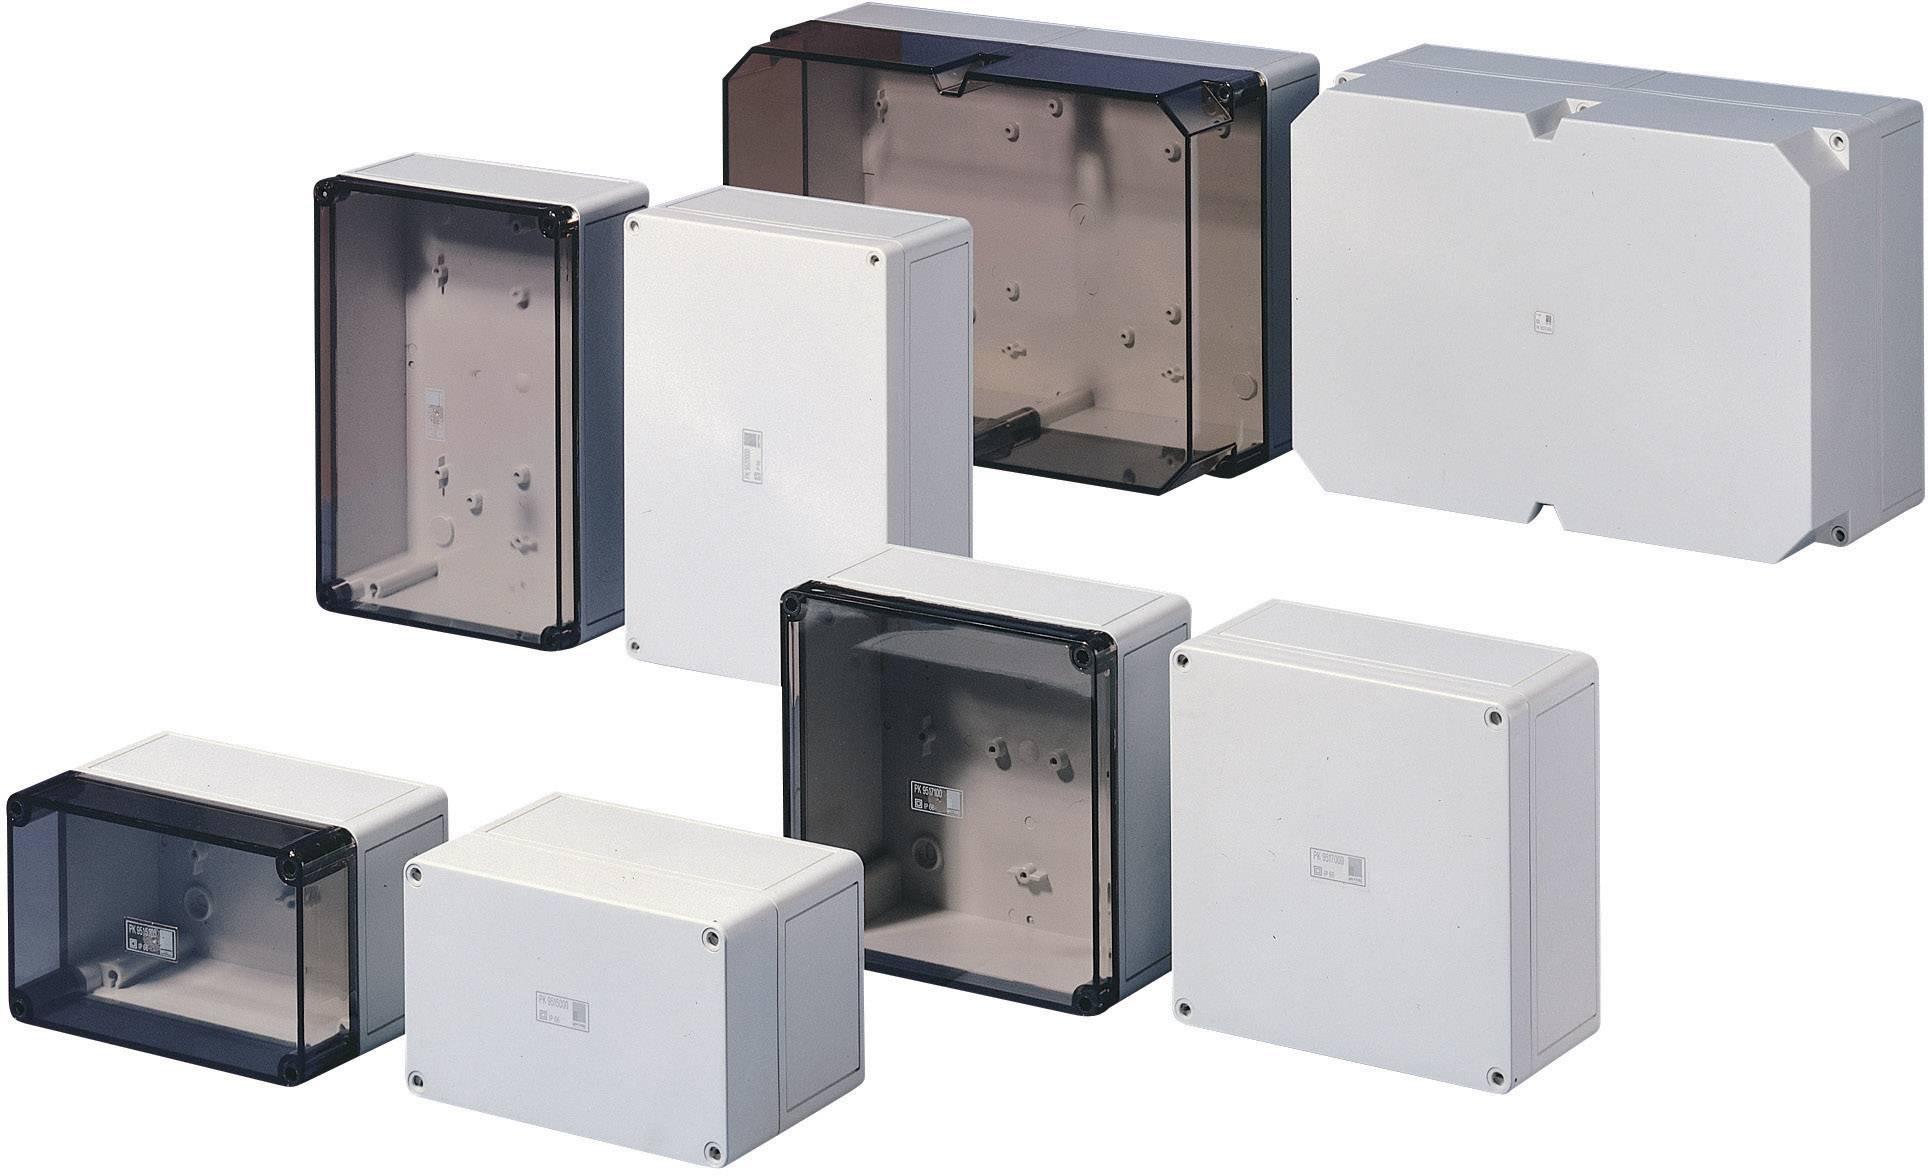 Instalační krabička Rittal PK 9517.000 182 x 180 x 90 polykarbonát světle šedá 1 ks